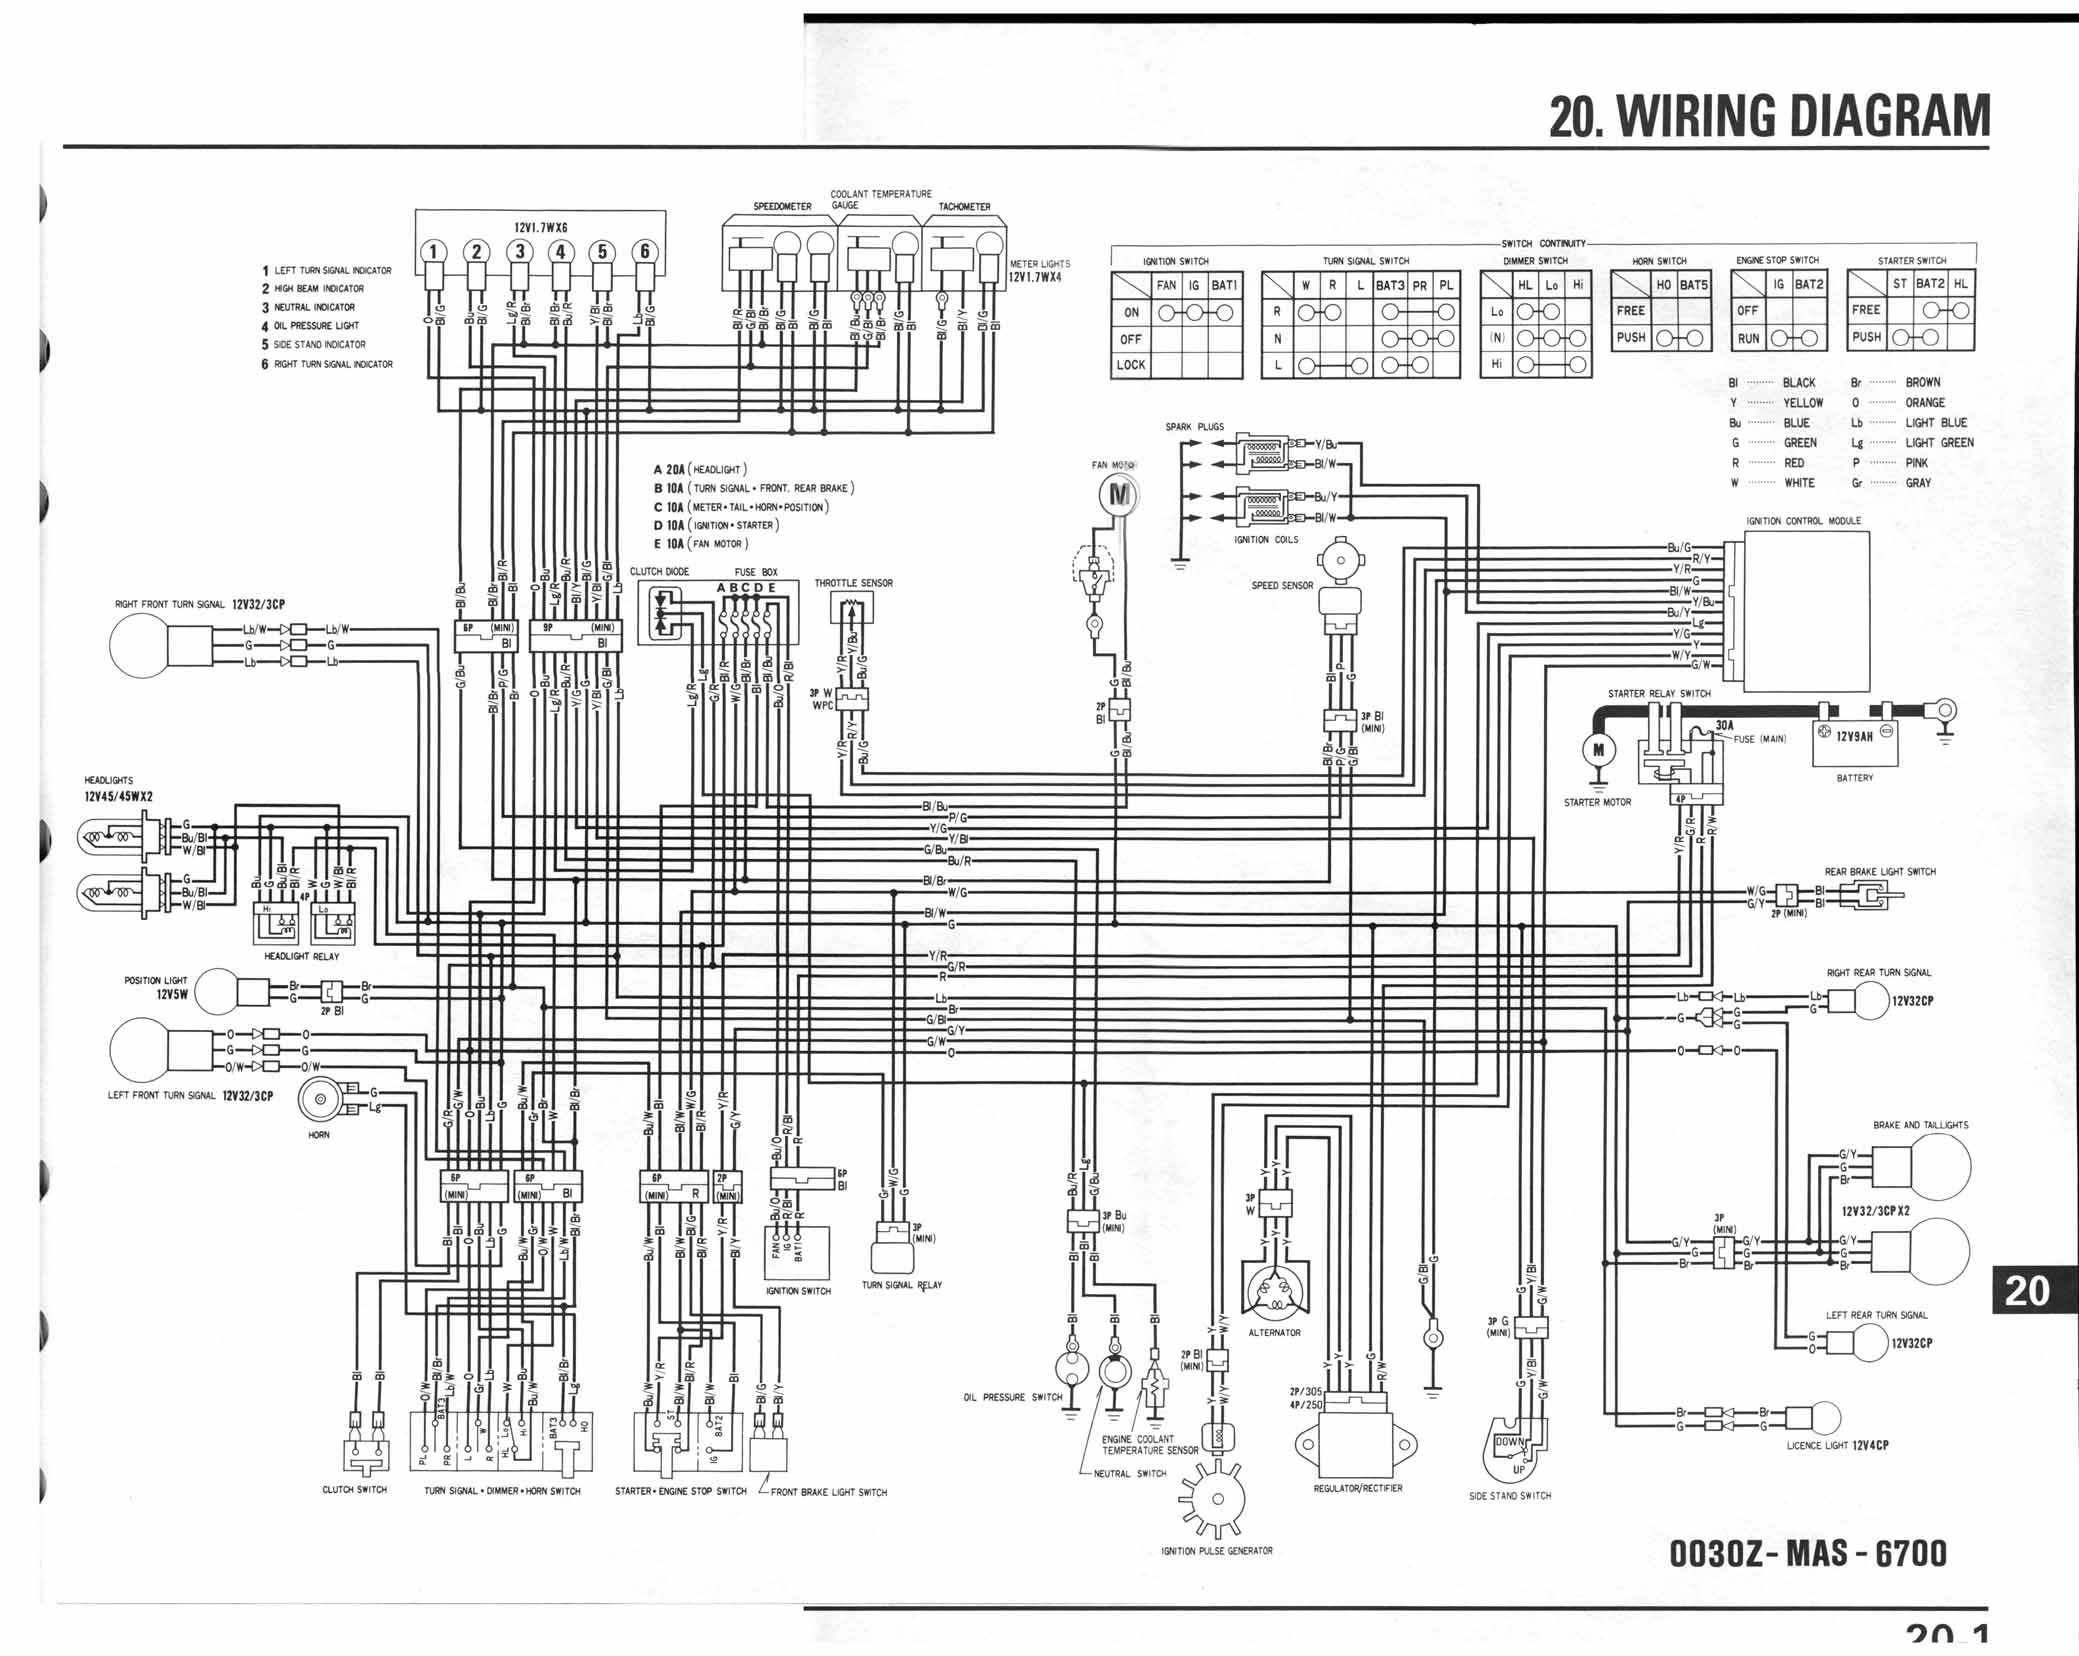 cb400f wiring diagram - wiring diagram shut-warehouse -  shut-warehouse.pmov2019.it  pmov2019.it